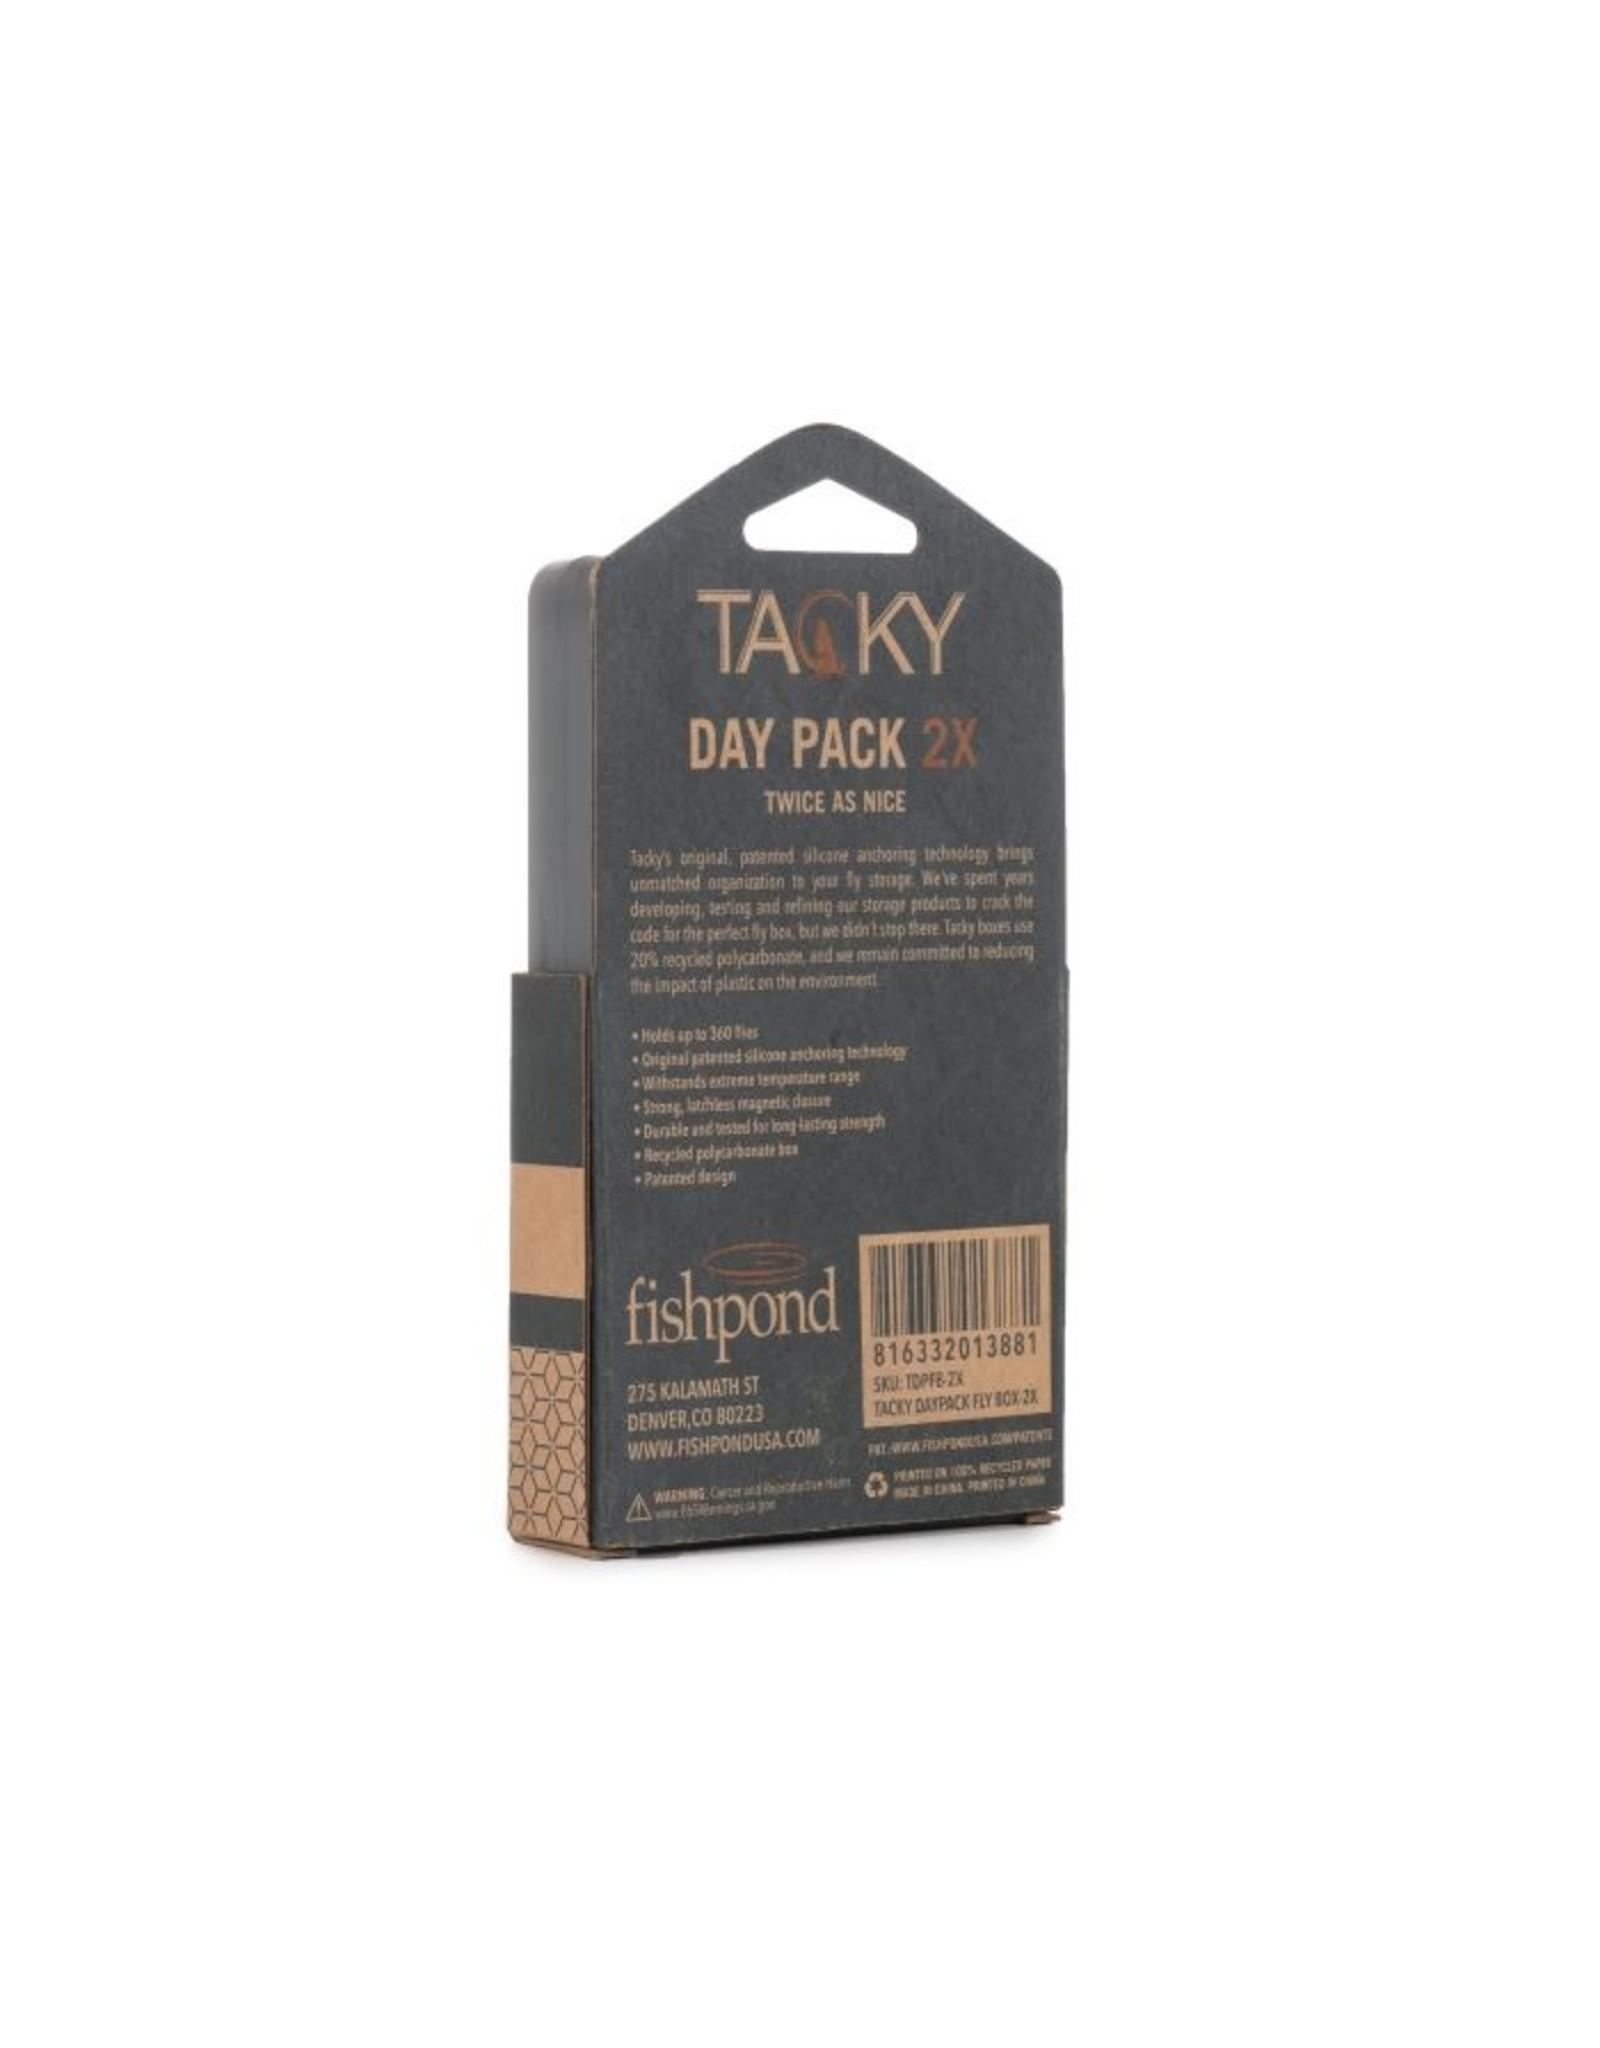 Fishpond Tacky Daypack Fly Box 2X